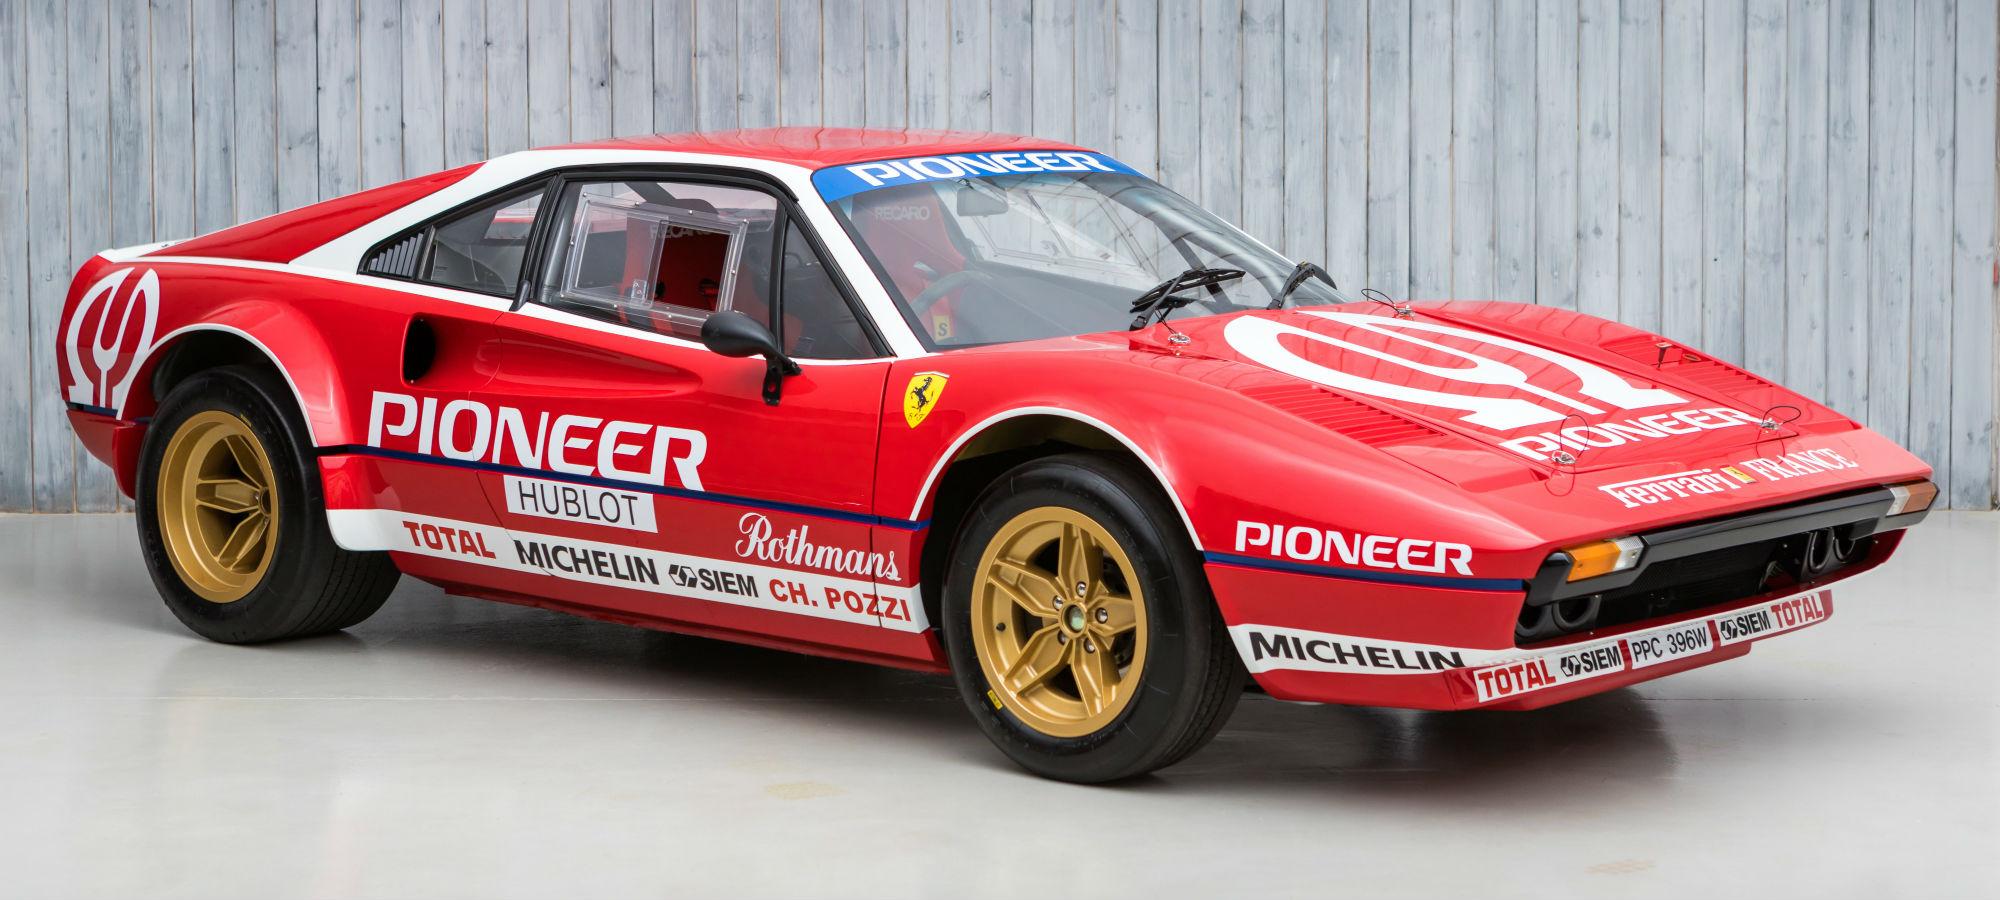 1981 Ferrari 308 GTB to FIA Group 4 Specification